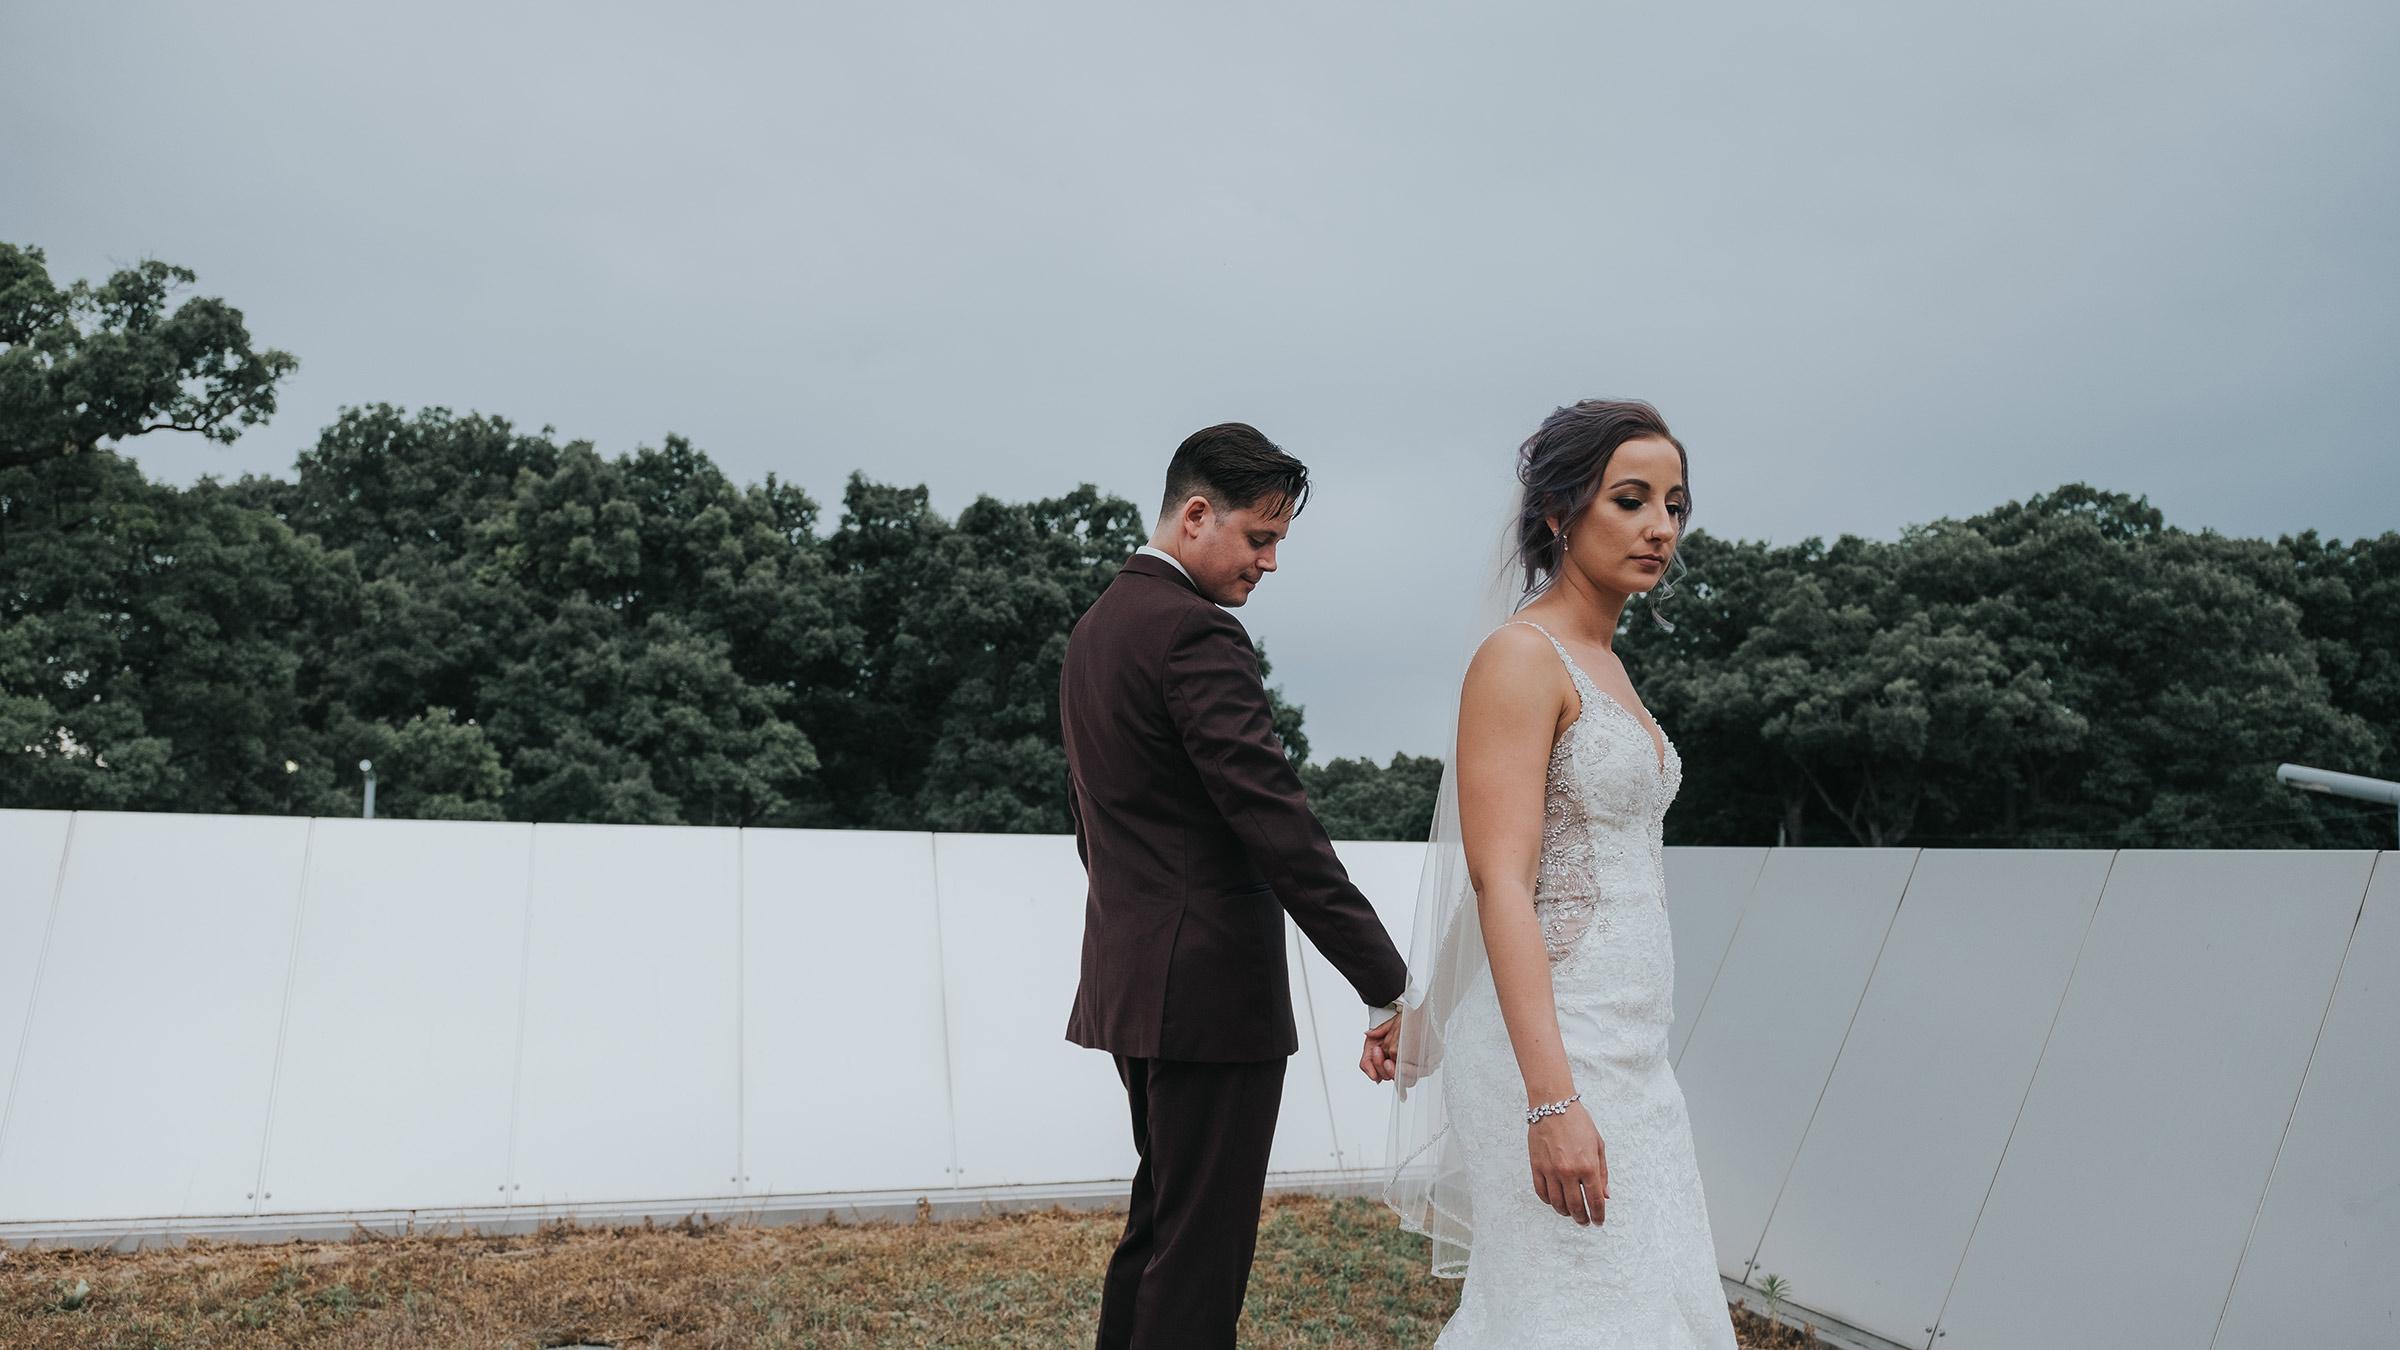 bride-groom-holding-hands-walking-opposite-desmoines-iowa-art-center-raelyn-ramey-photography.jpg